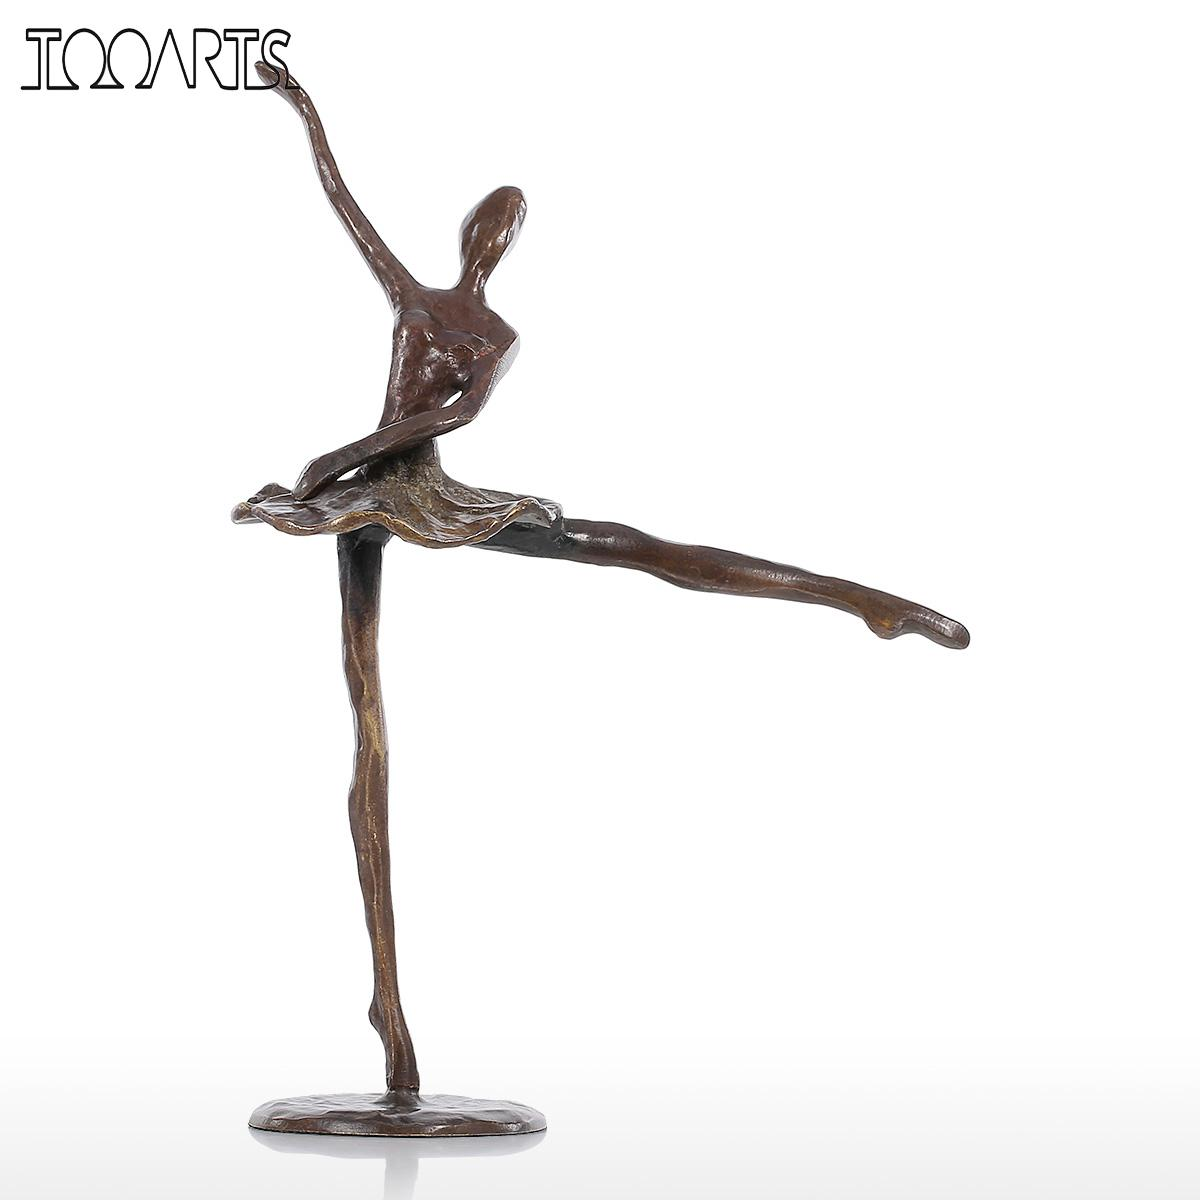 online get cheap modern statues aliexpresscom  alibaba group - tooarts mini figurines ballet bronze statue artificial home decor metalsculpture modern dance gift home decoration